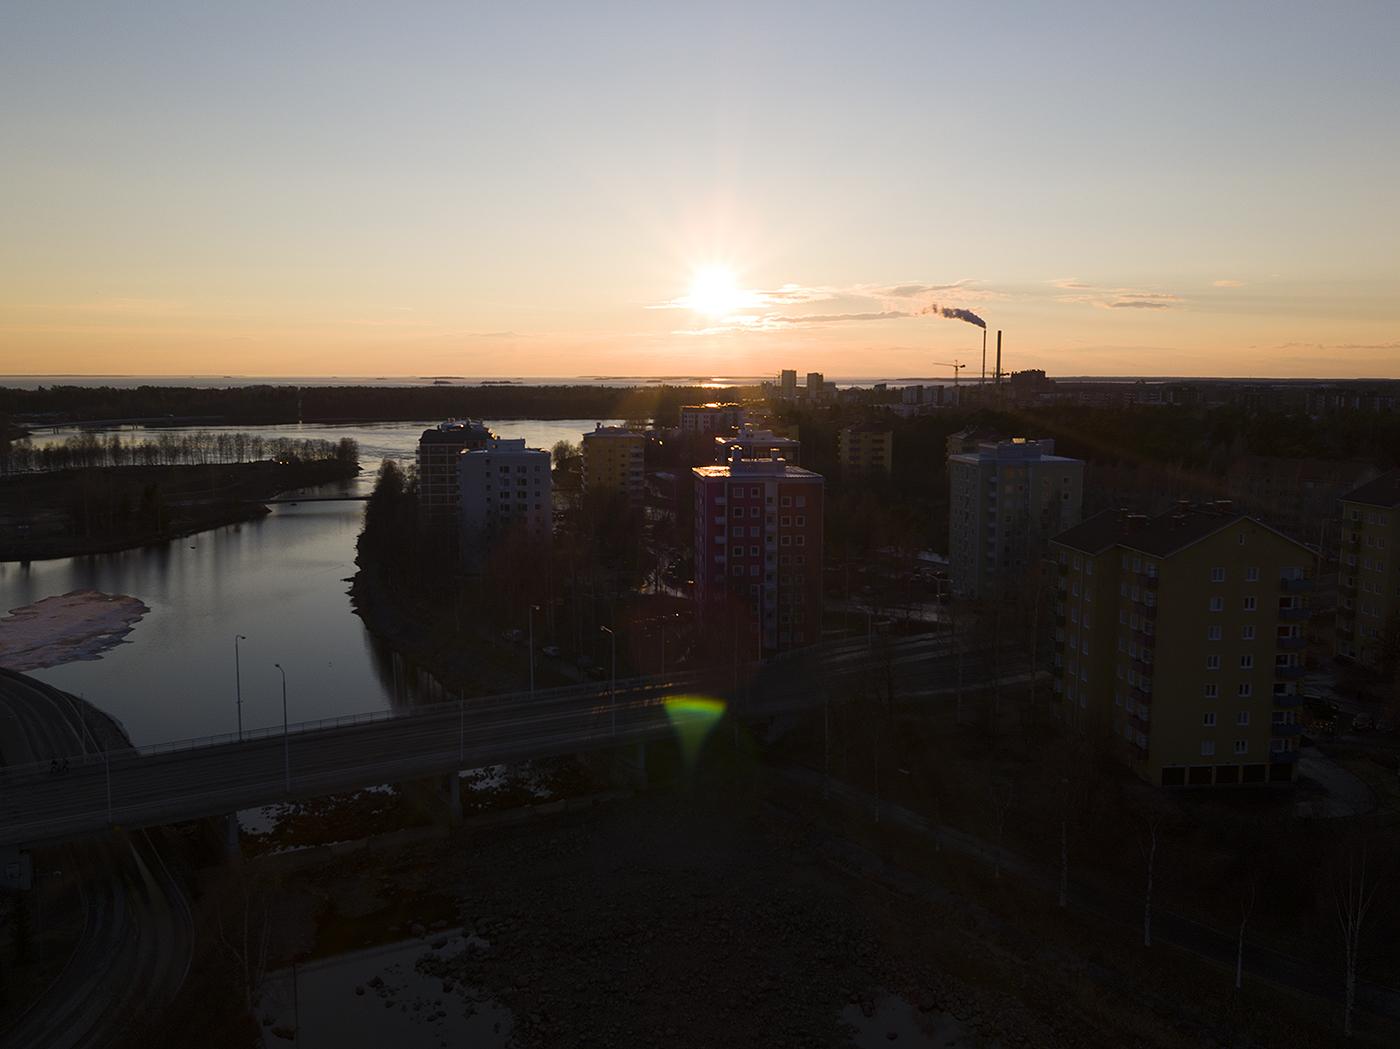 tuira_aerial_horisont.jpg